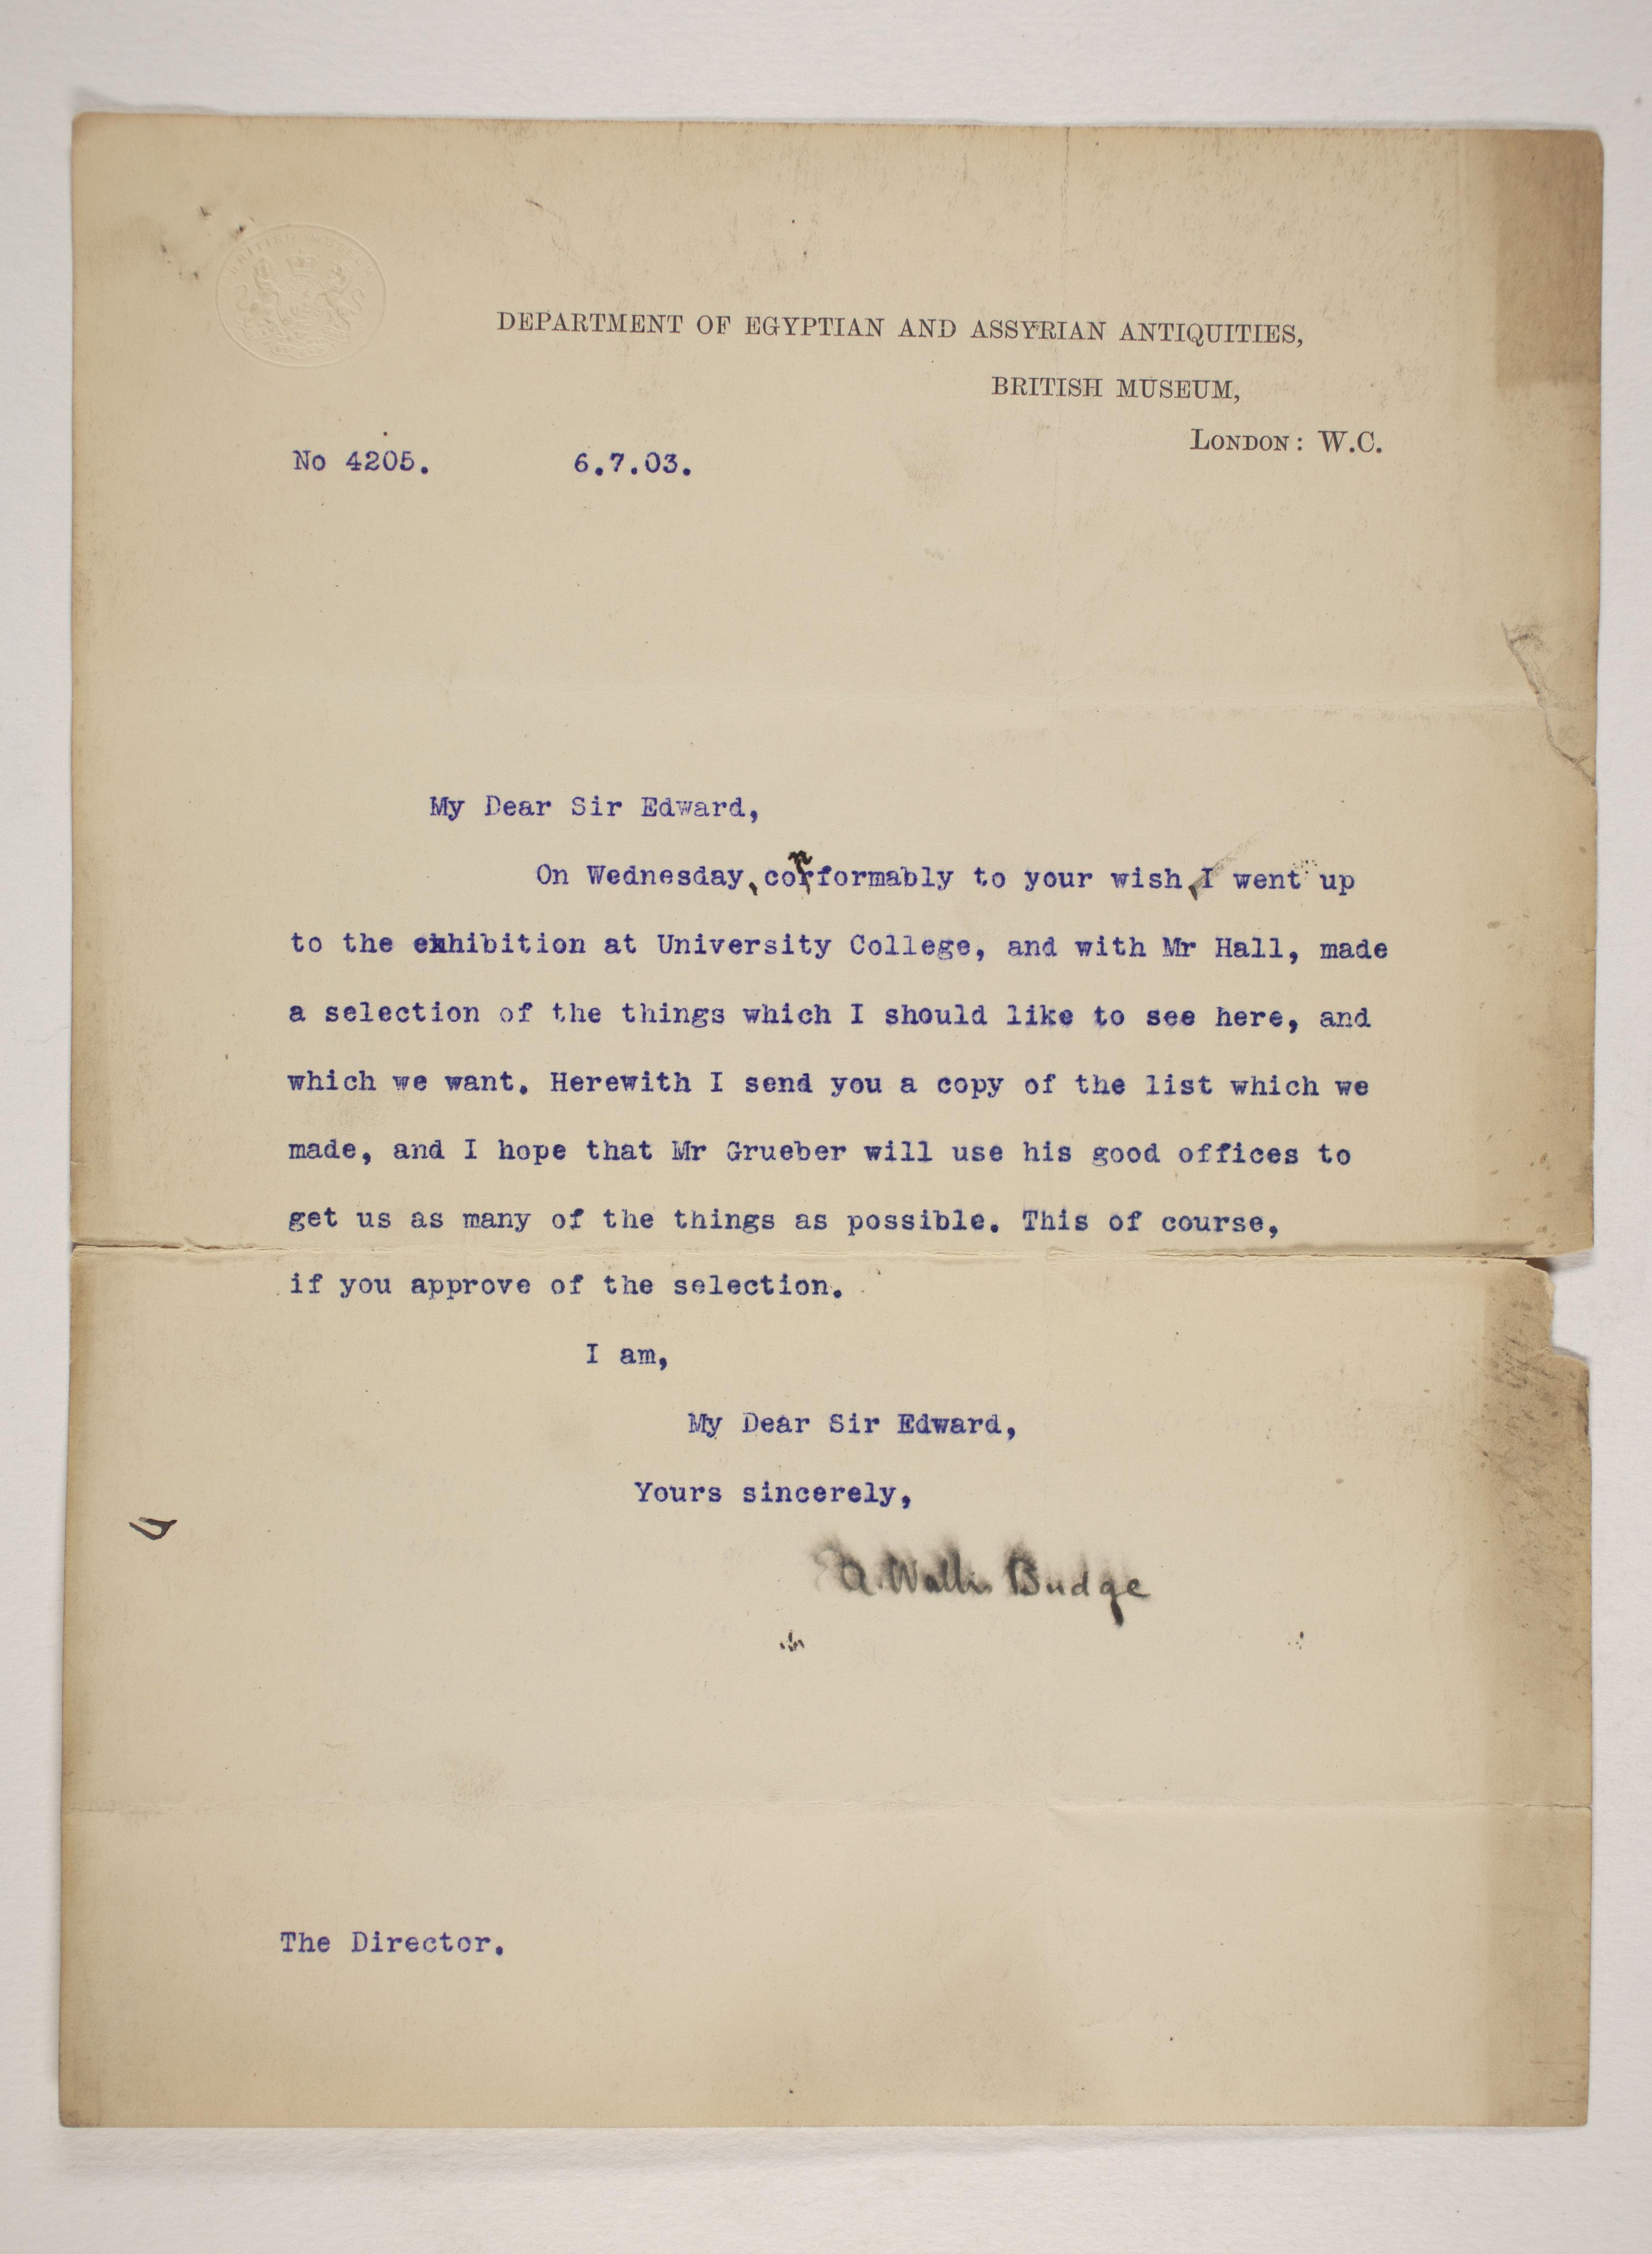 1902-03 Abydos Correspondence PMA/WFP1/D/11/68